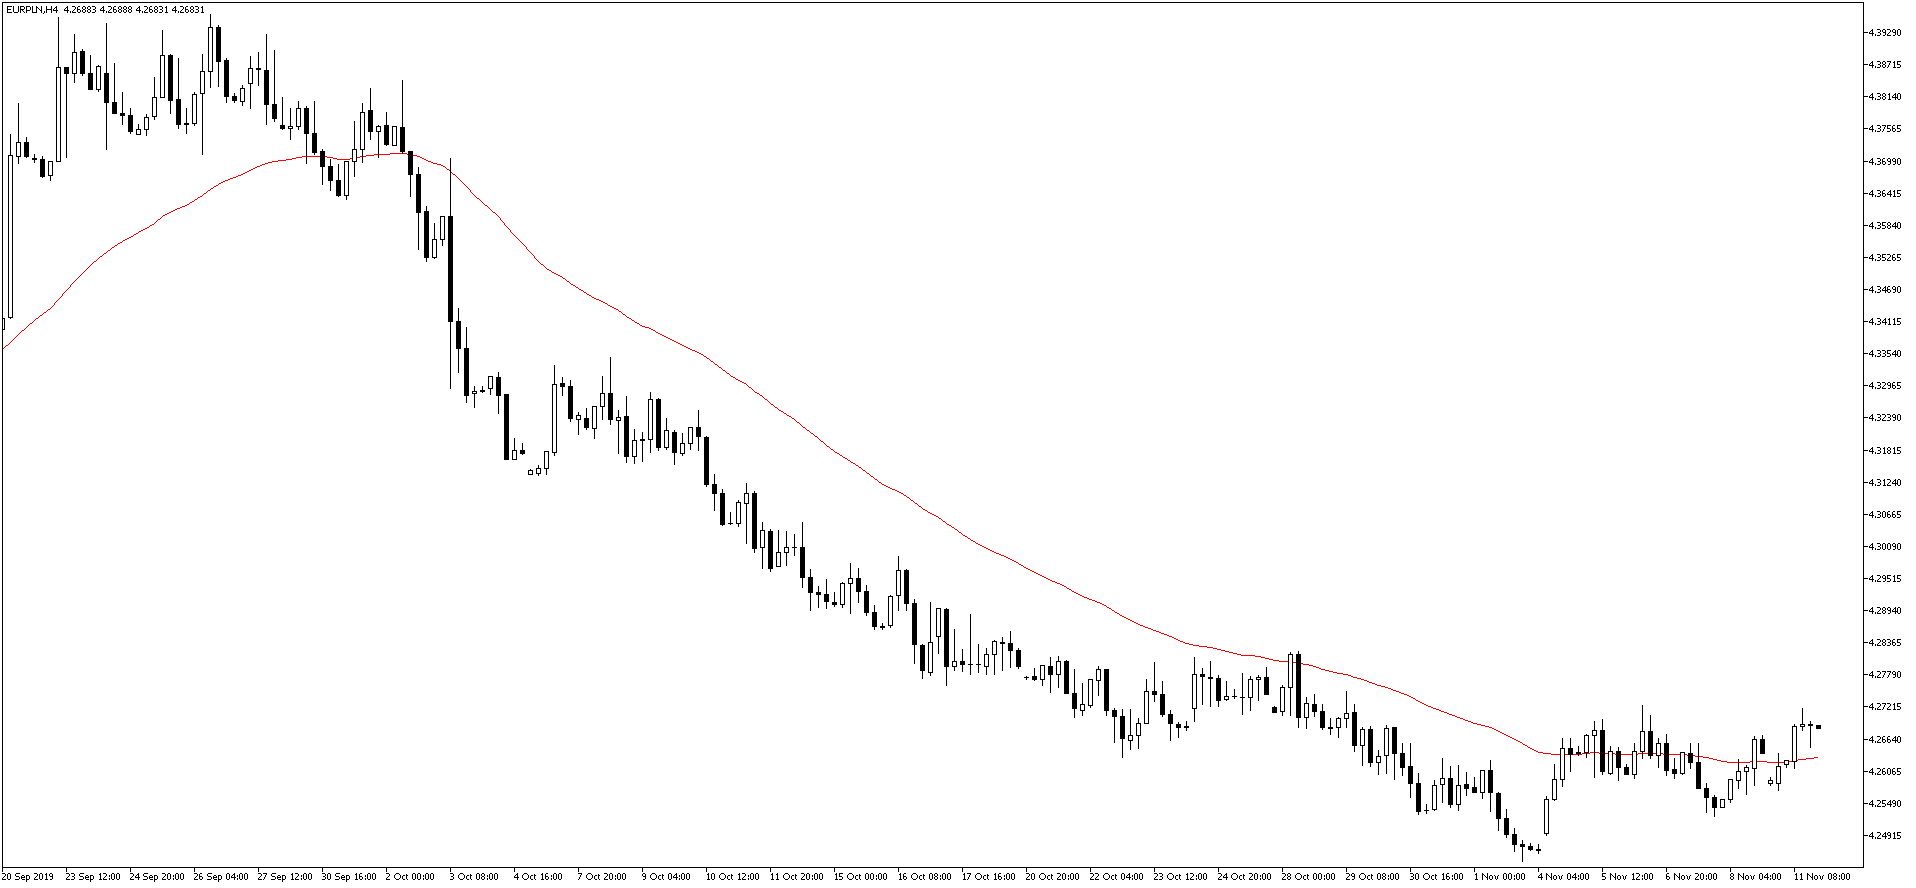 EURPLNH4 kurs euro 11.11